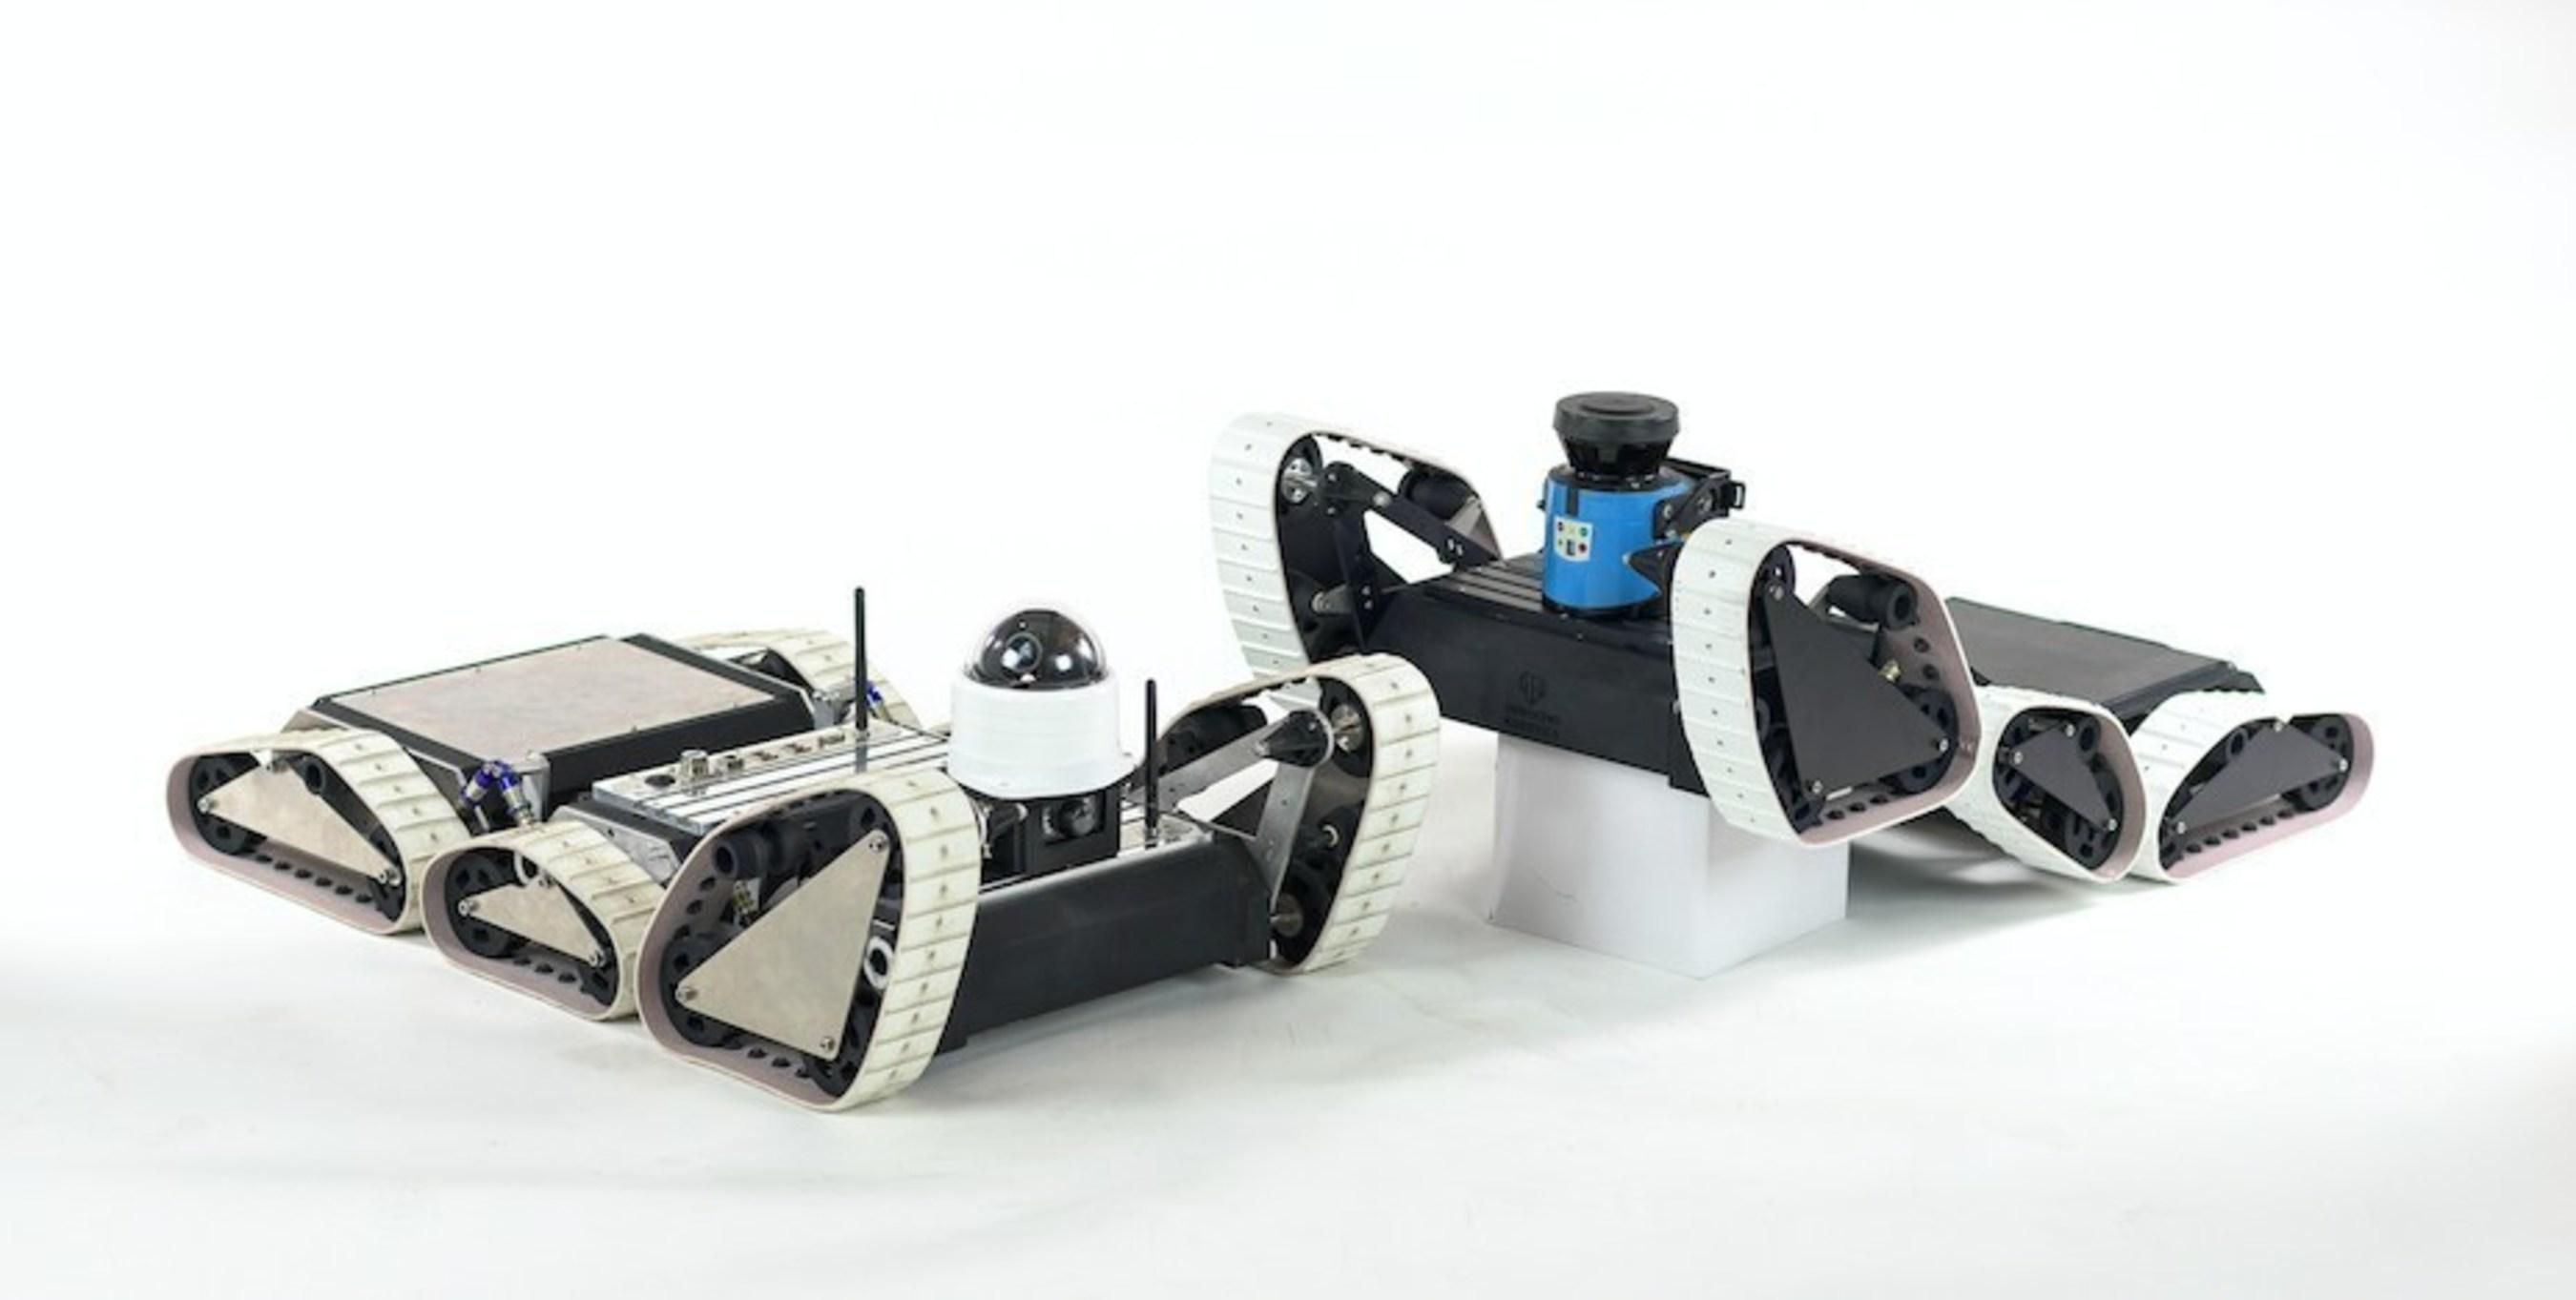 Transcend Robotics Introduces ARTI3 Product Line for Mobile Ground Robotics